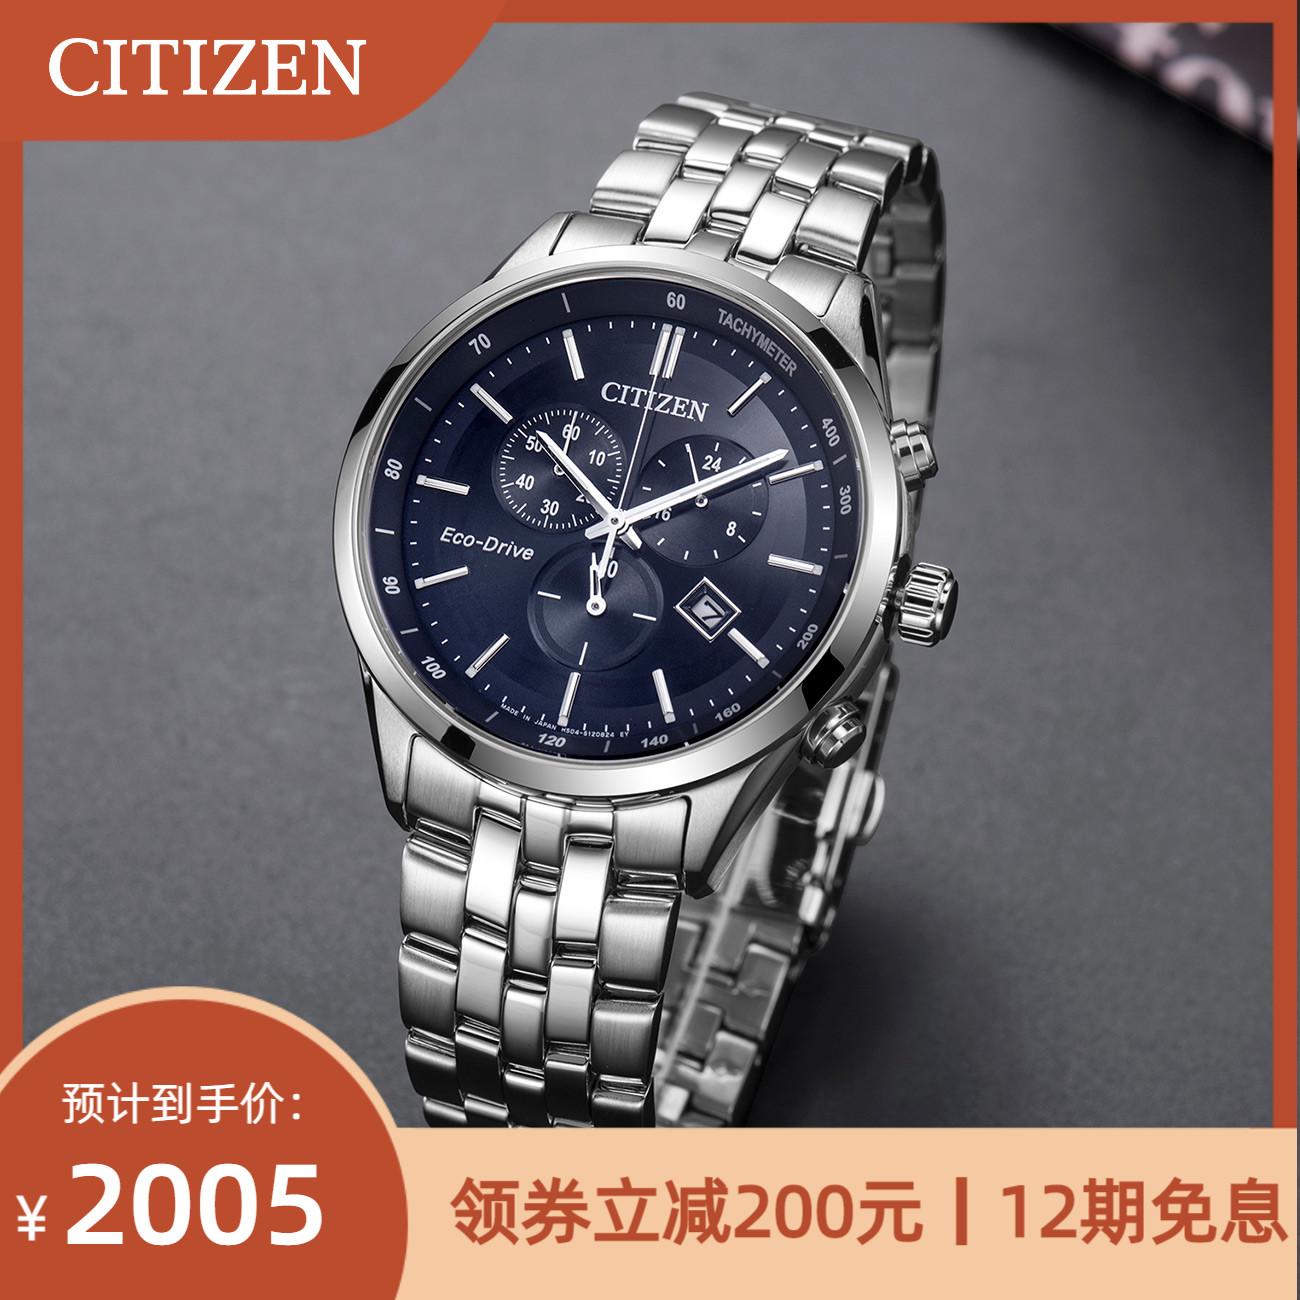 Citizen日本西铁城手表男光动能商务简约休闲钢带腕表AT2140-55L